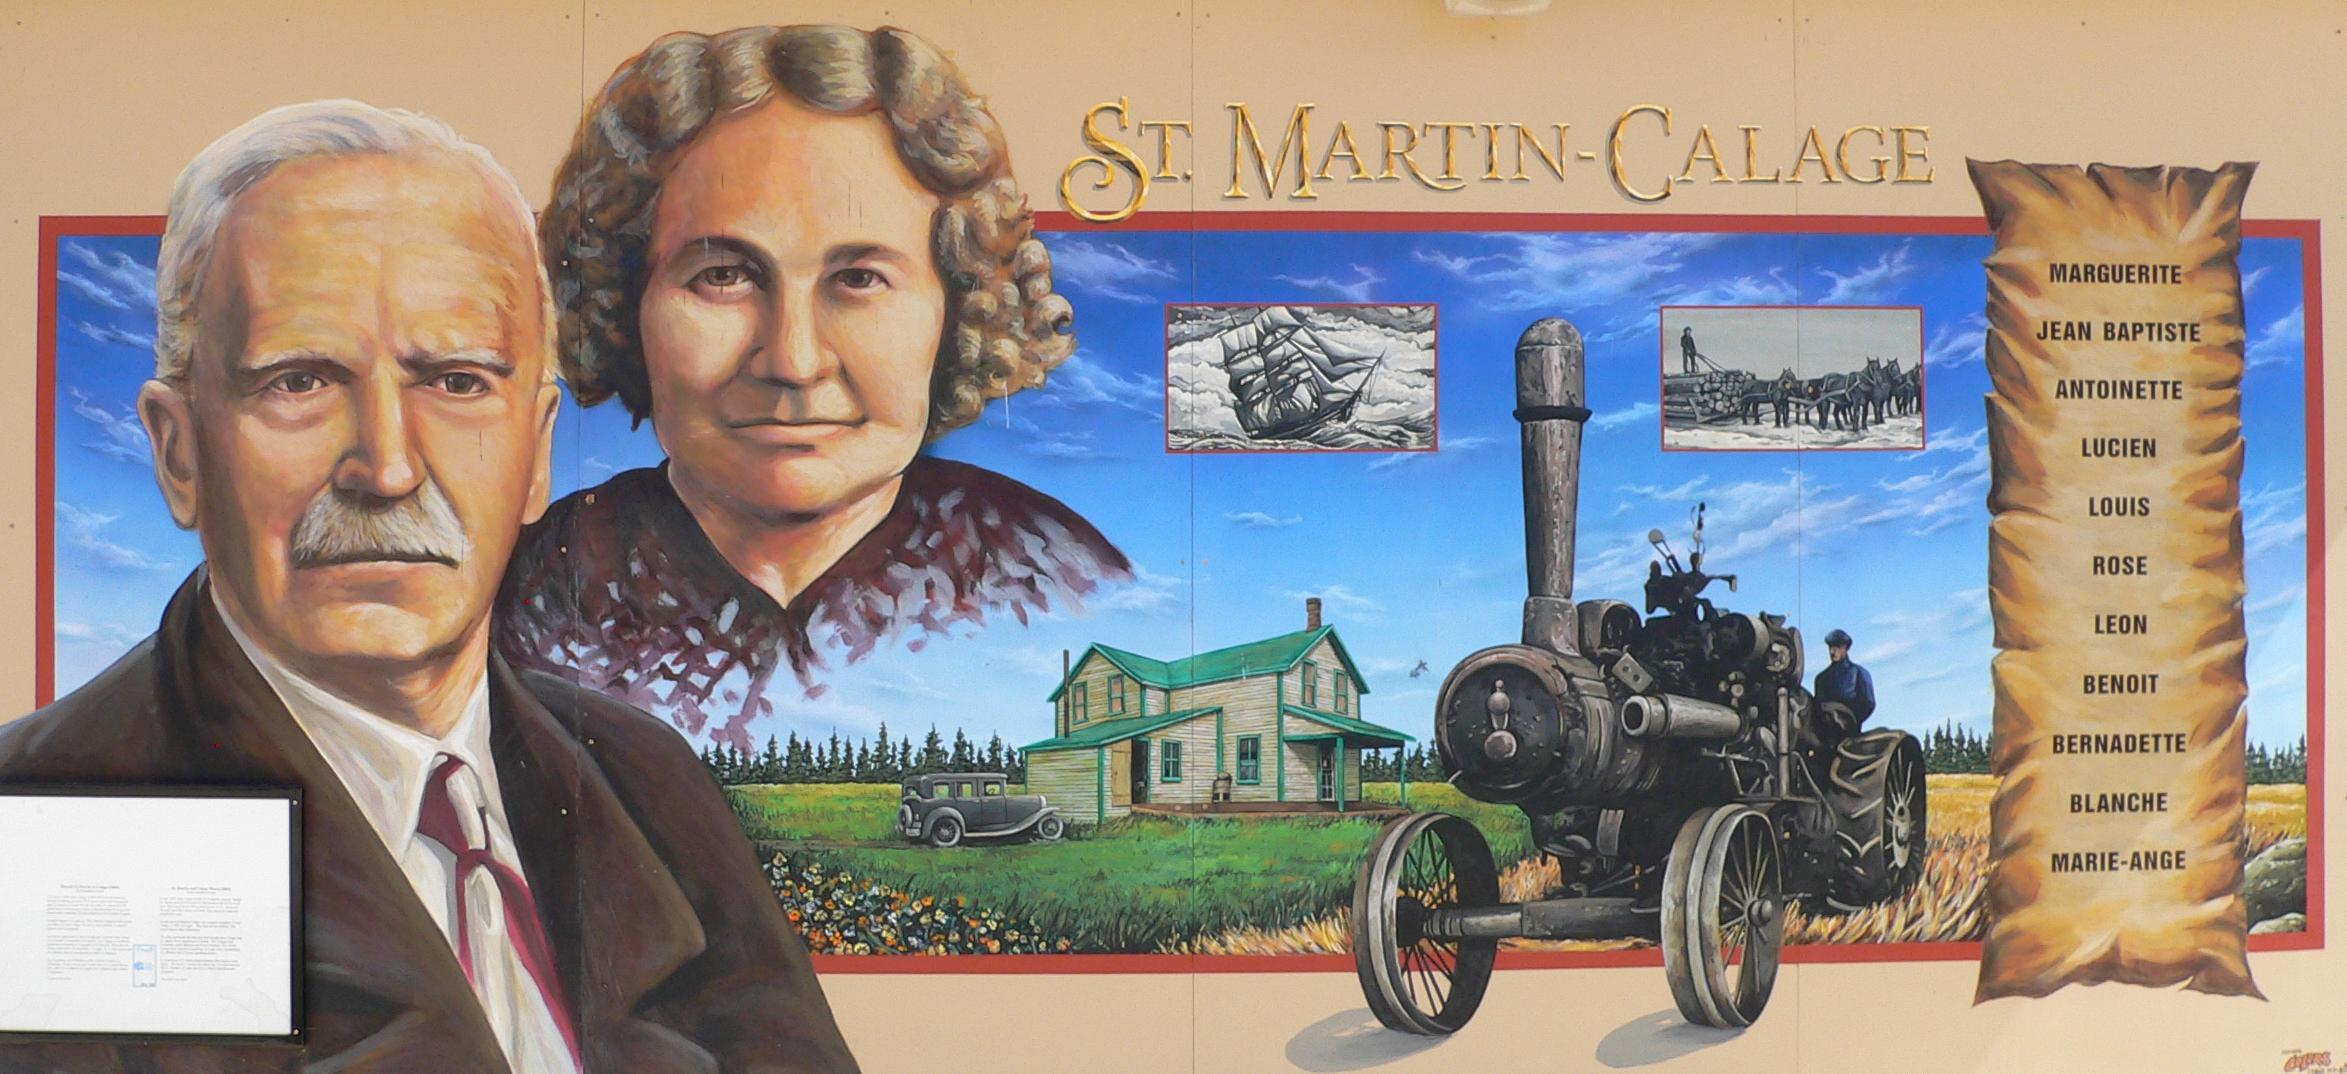 st-martin-calage